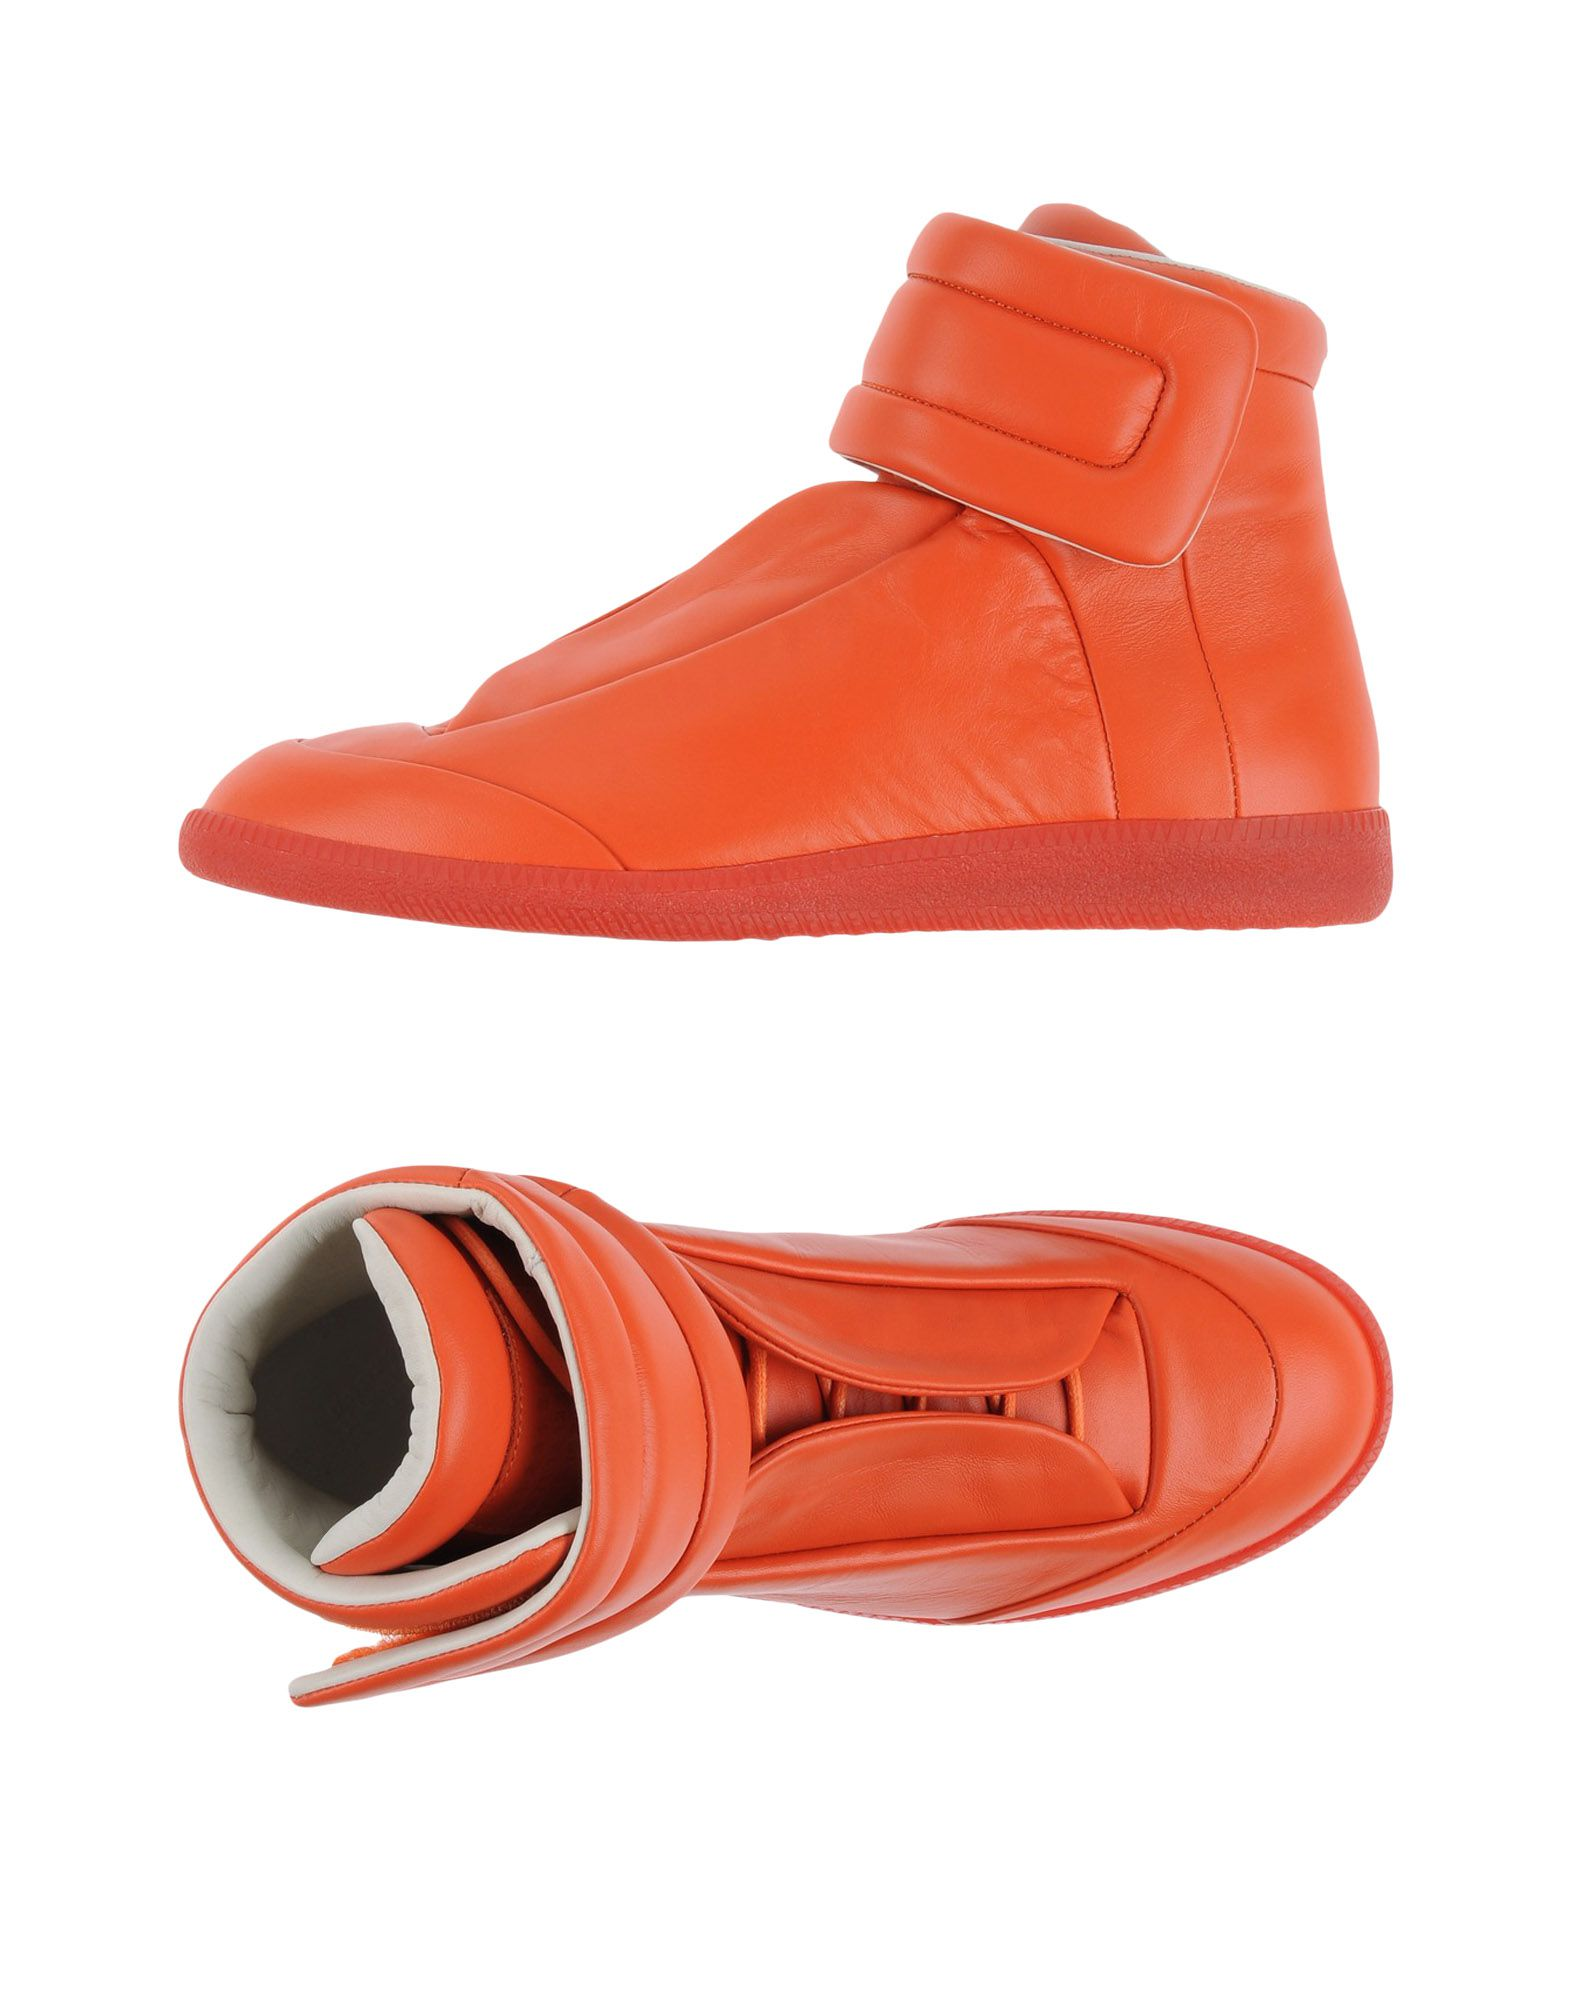 Maison Margiela Sneakers Herren  11114048DX Gute Qualität beliebte Schuhe